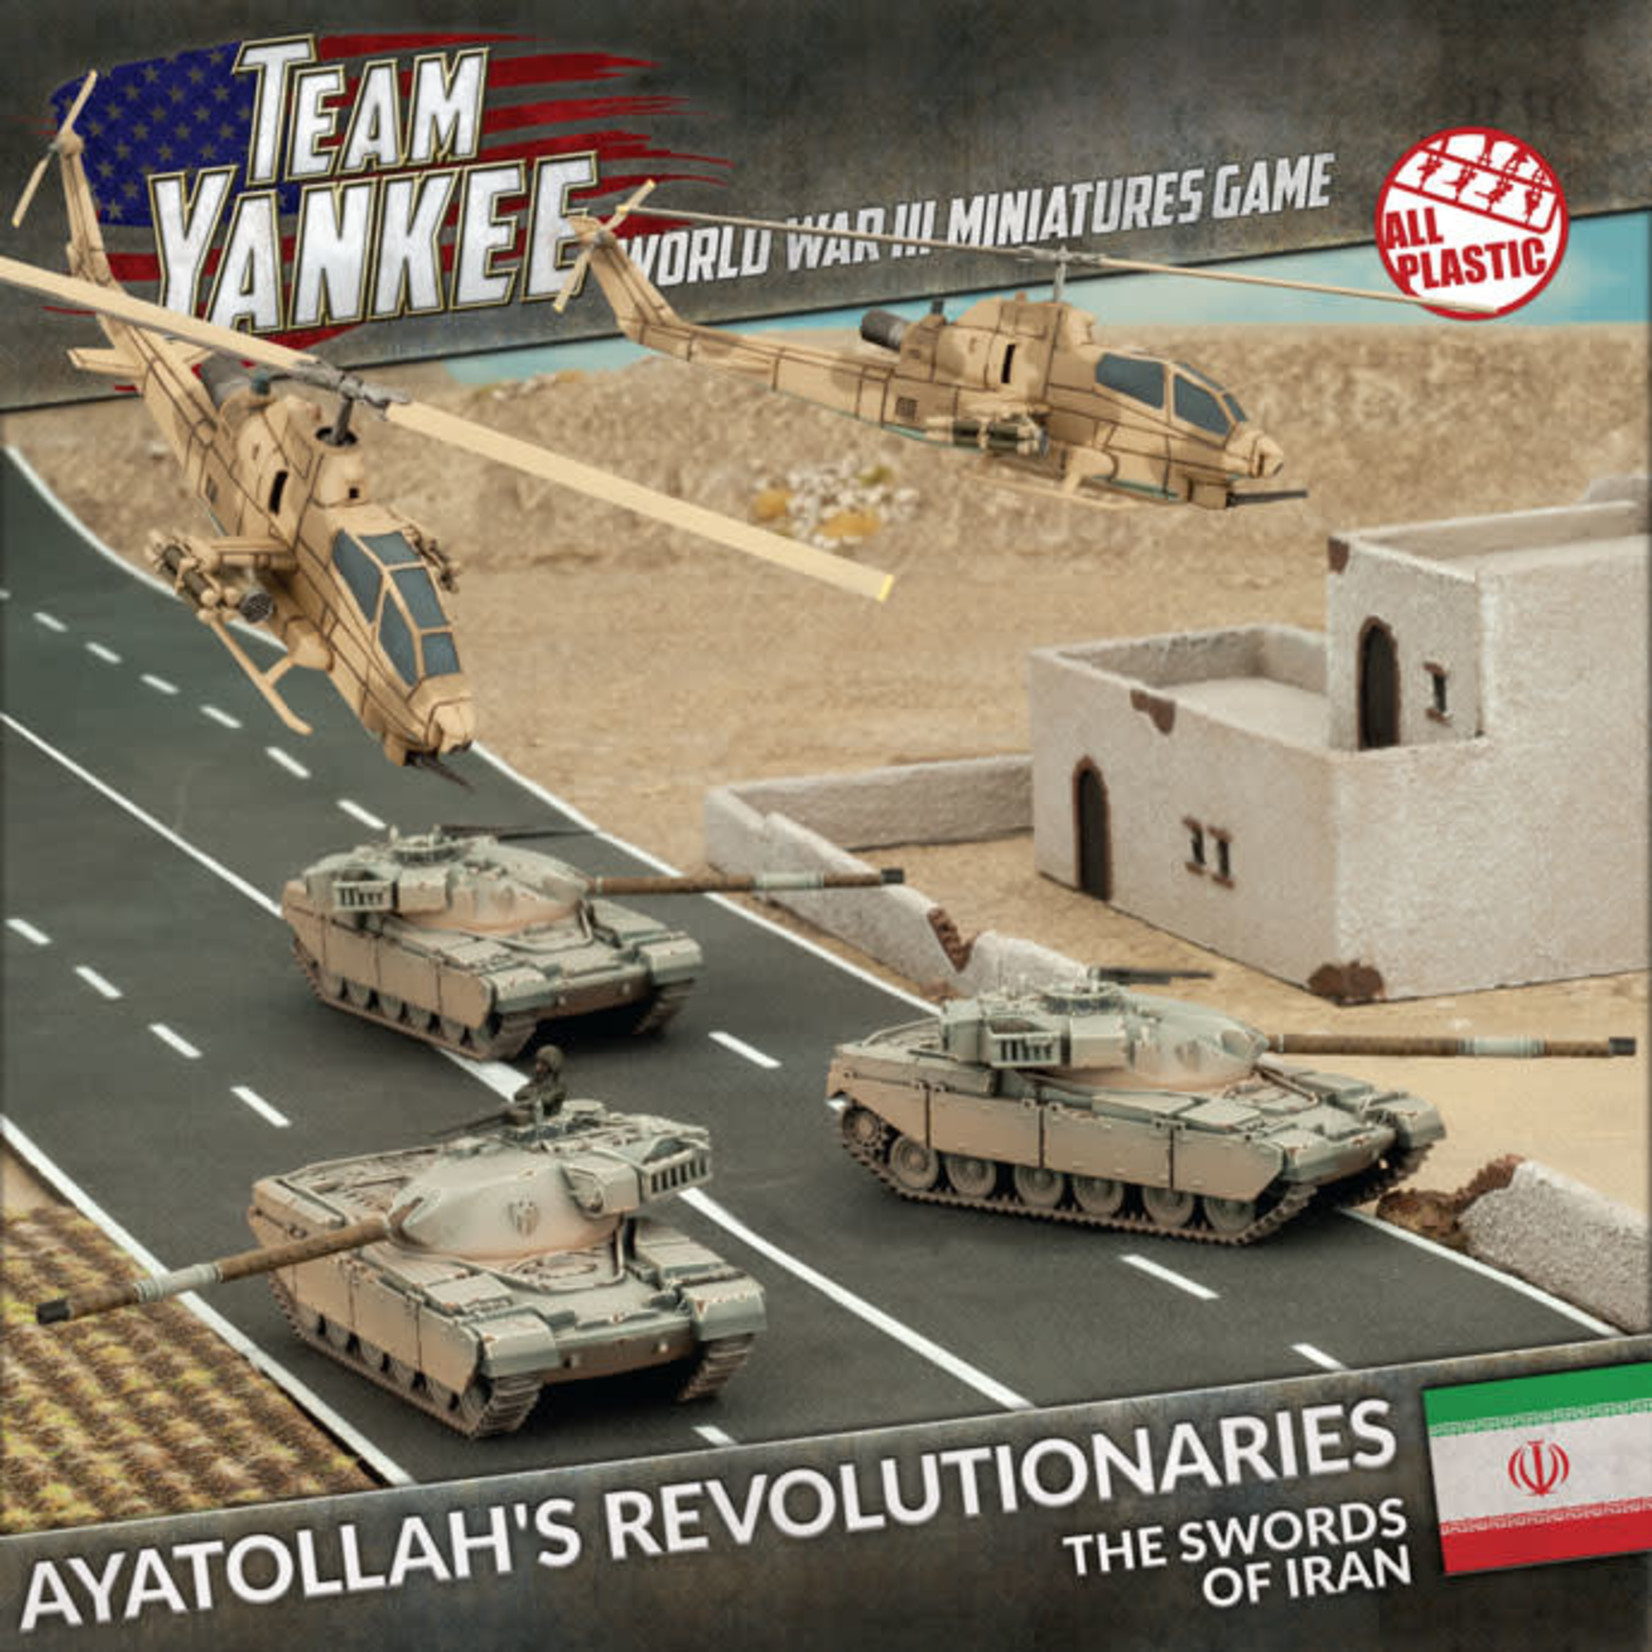 Battlefront Miniatures Ltd Team Yankee - World War III | Ayatollah's Revolutionaries (Plastic Army Deal)